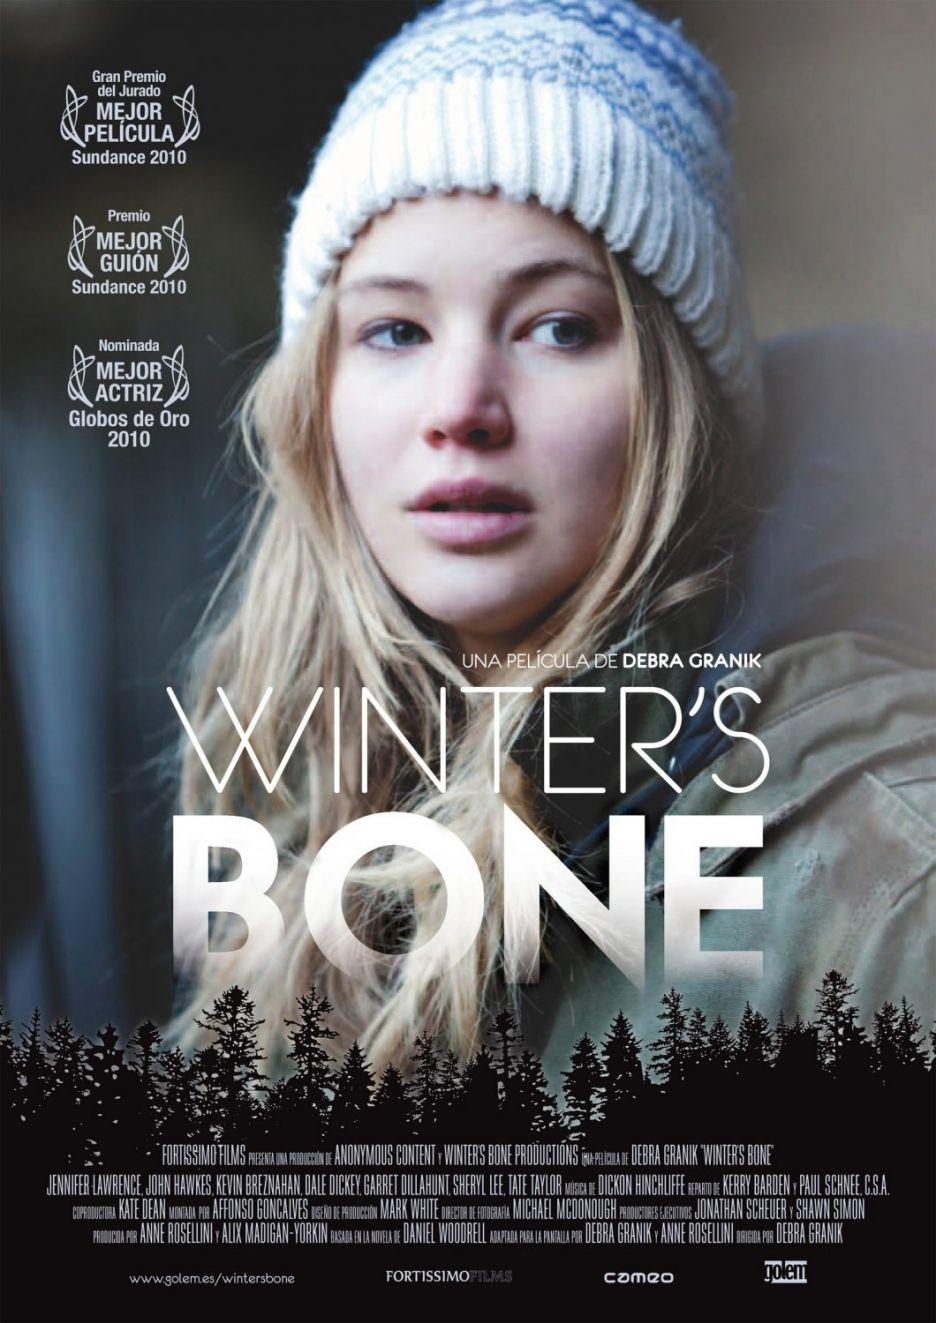 Winter's Bone lol appropriate title eveninthewinter